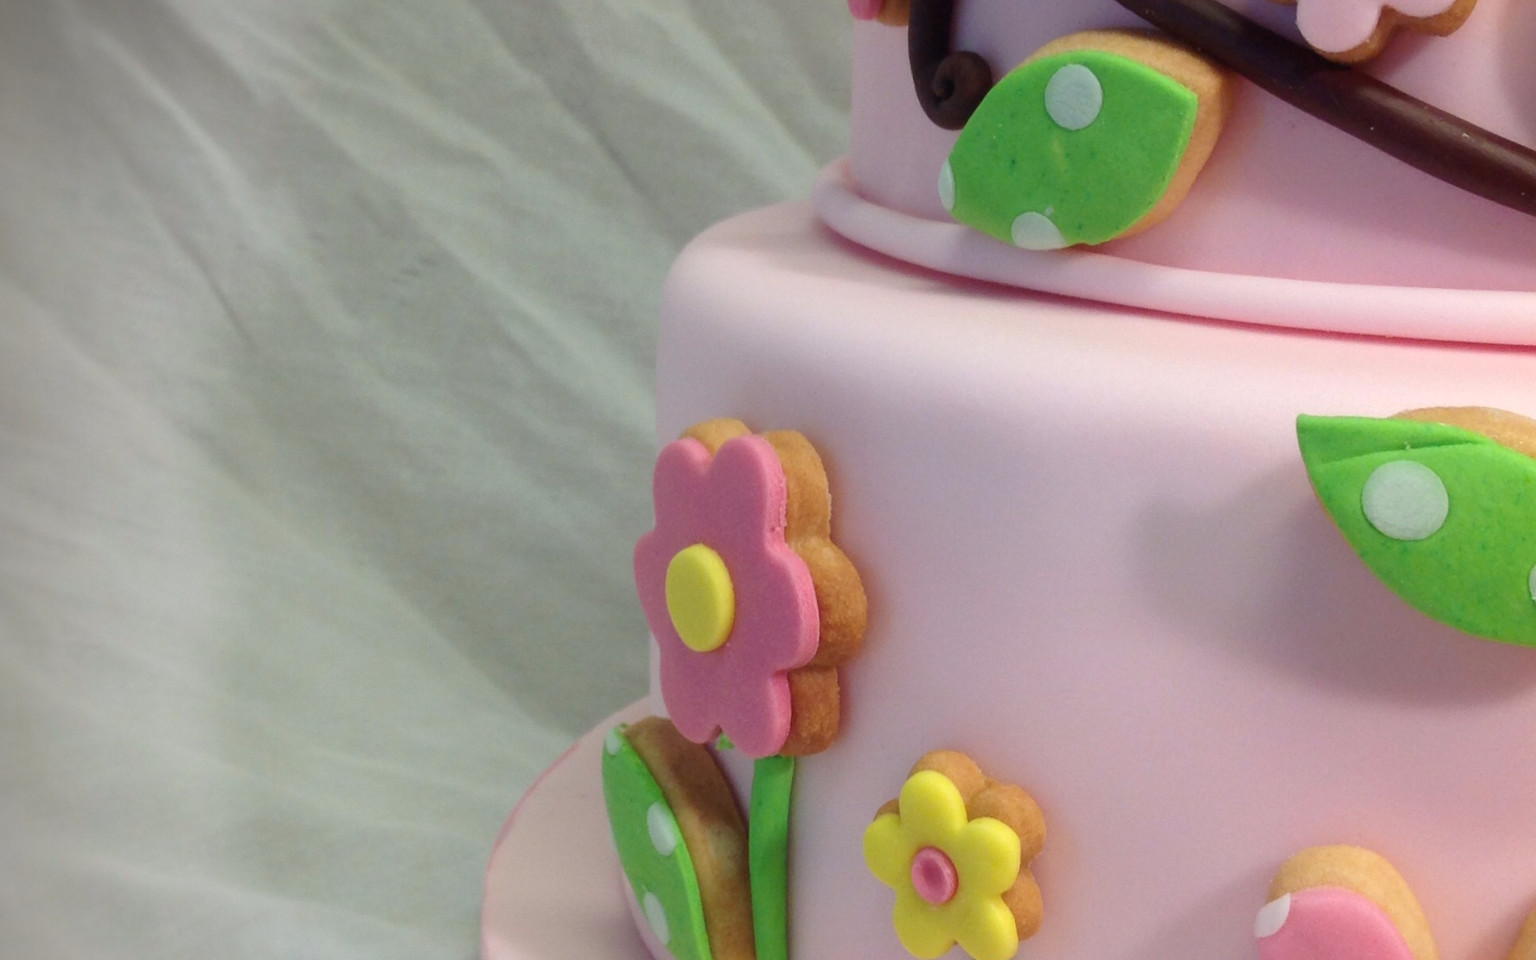 torte cake artist